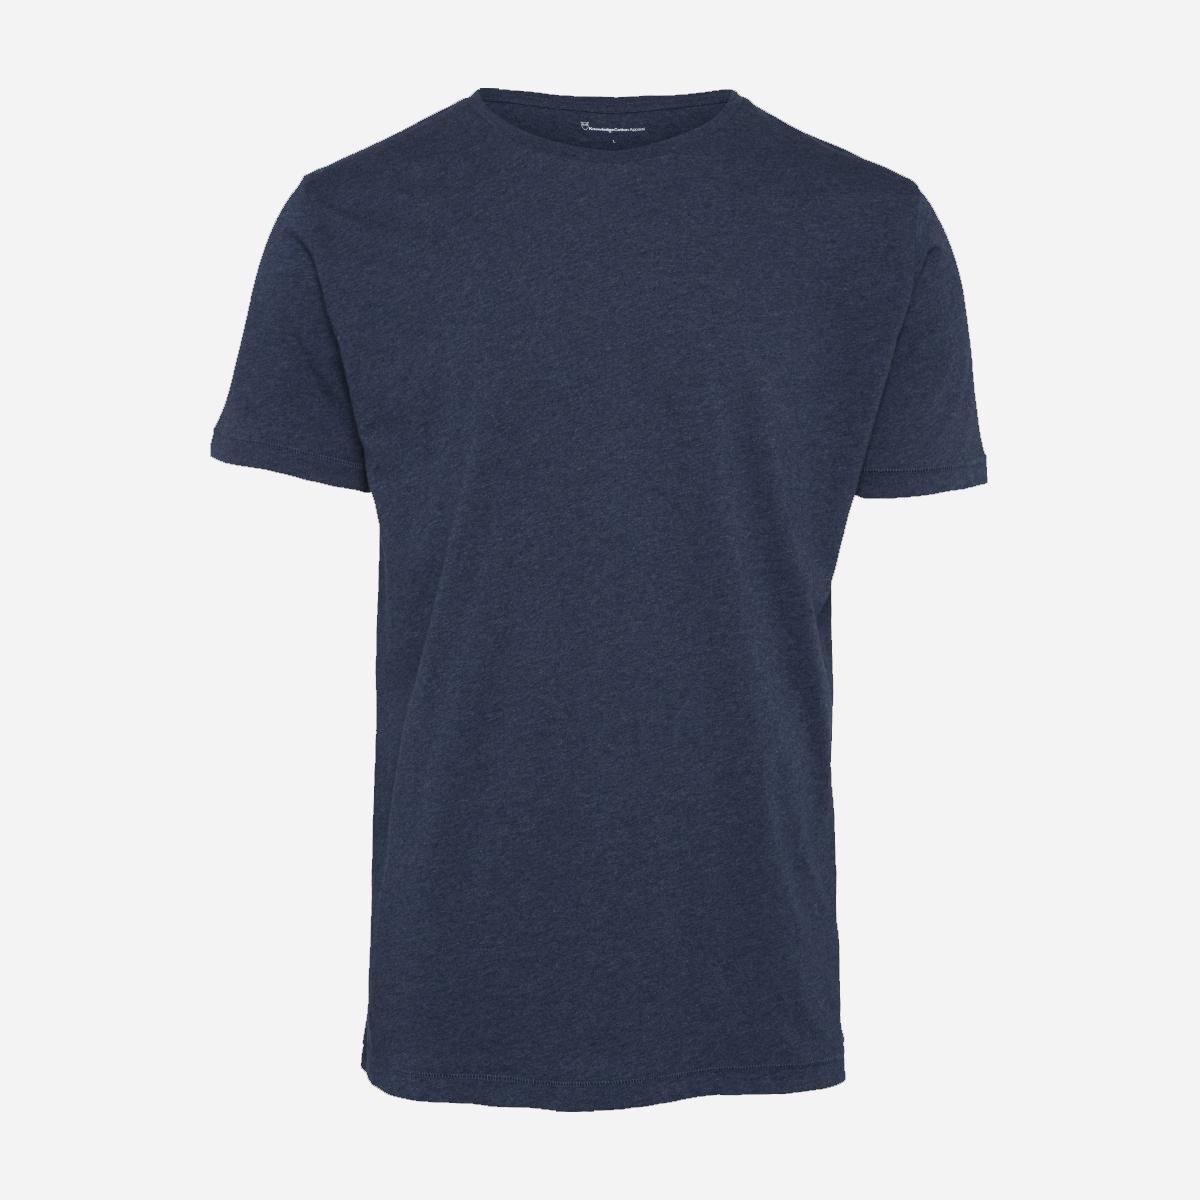 Alder Basic Insignia Blue ekologiska shirt från KNOWLEDGE COTTON APPAREL